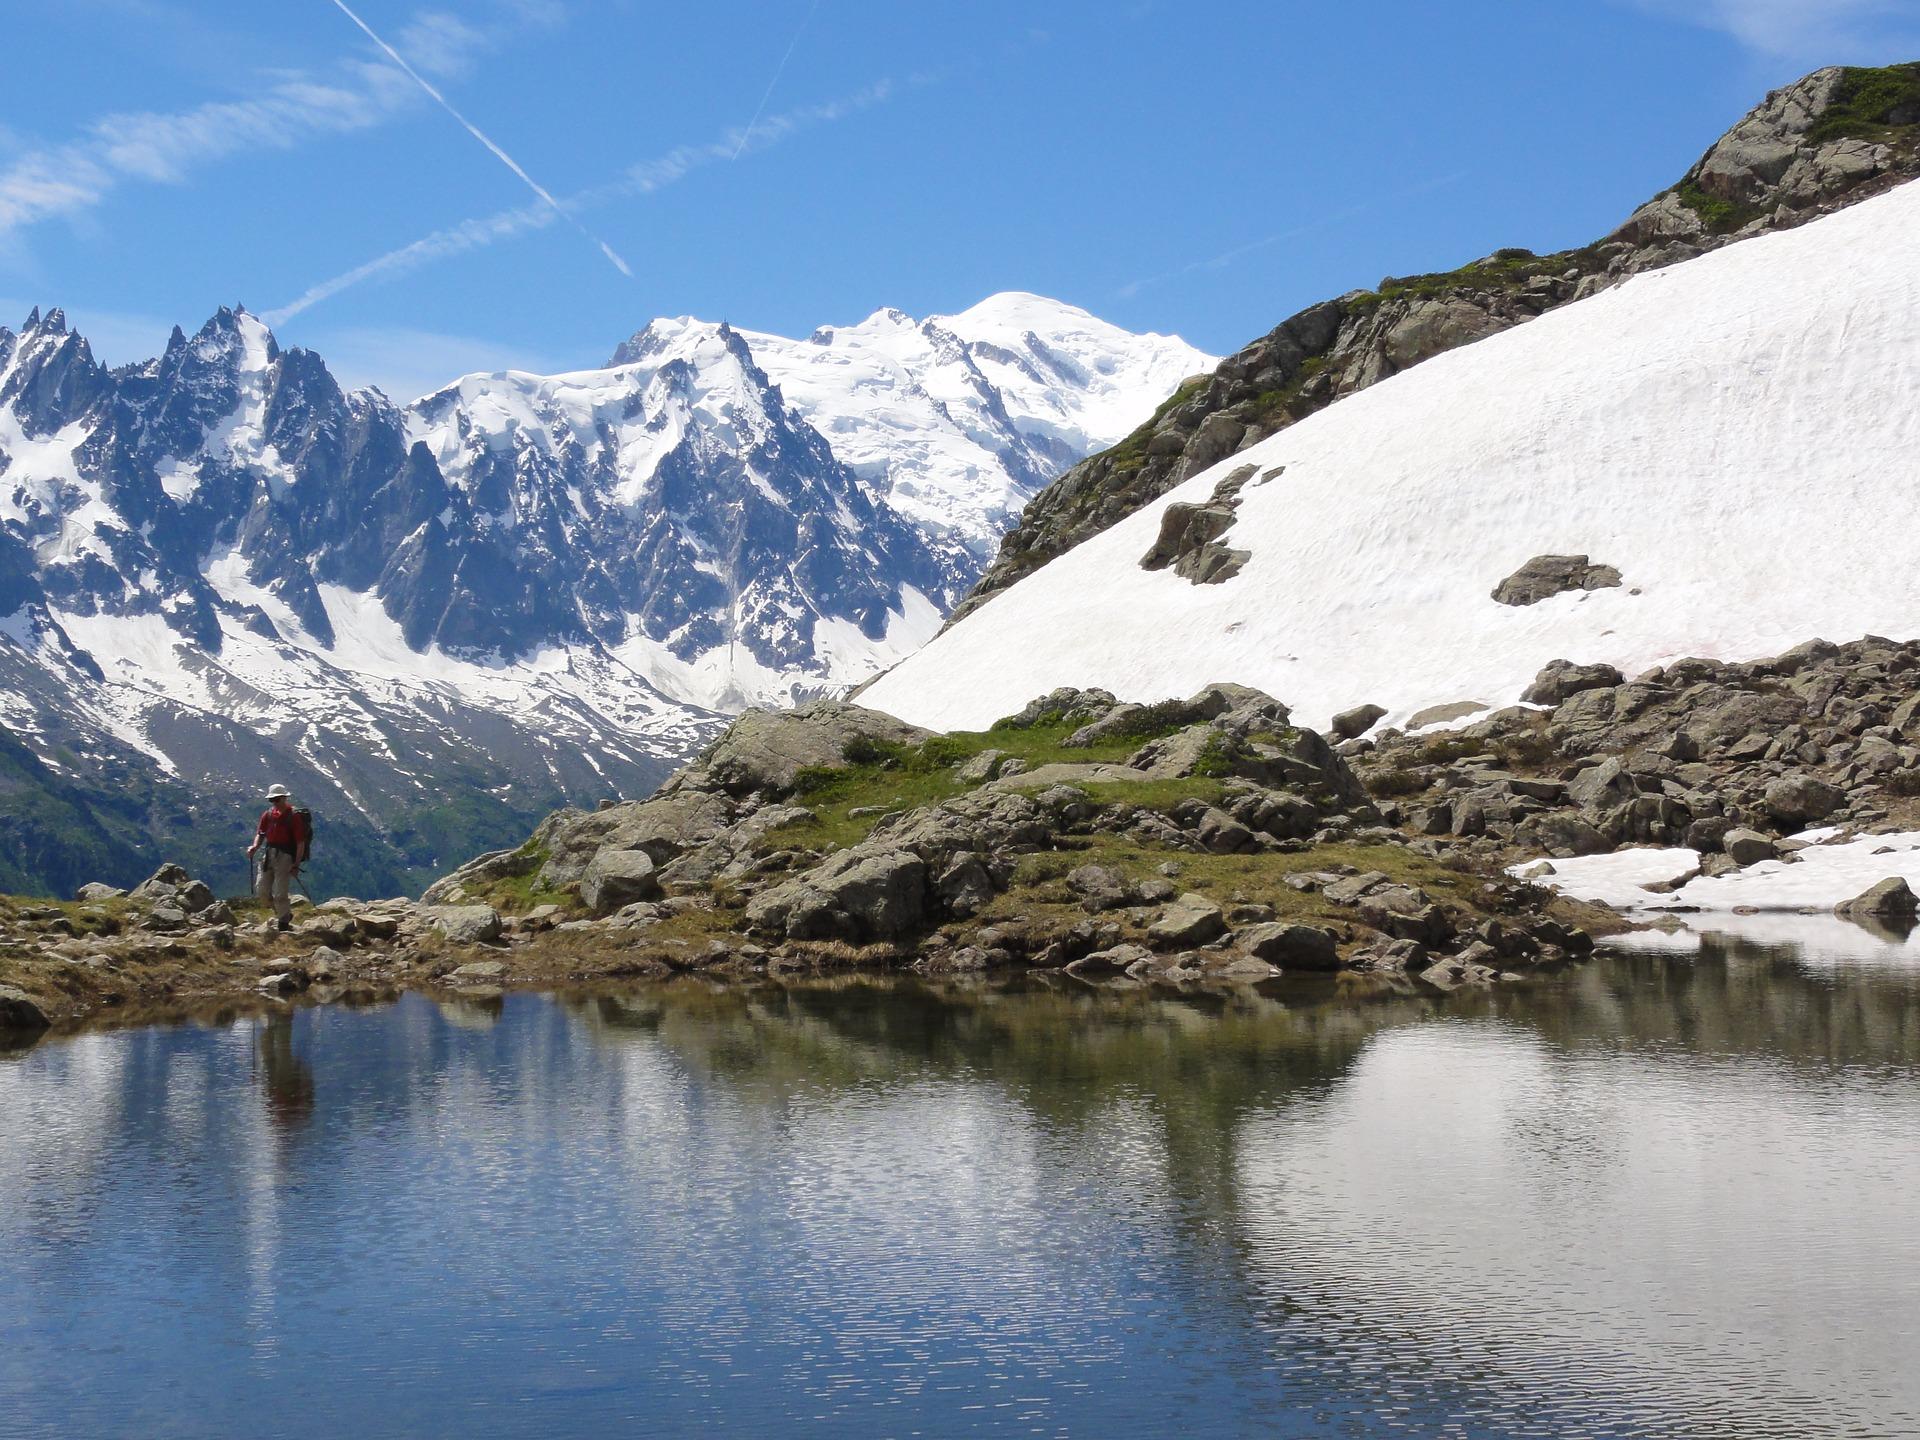 Lac_Blanc_CC0.jpg?1545479725